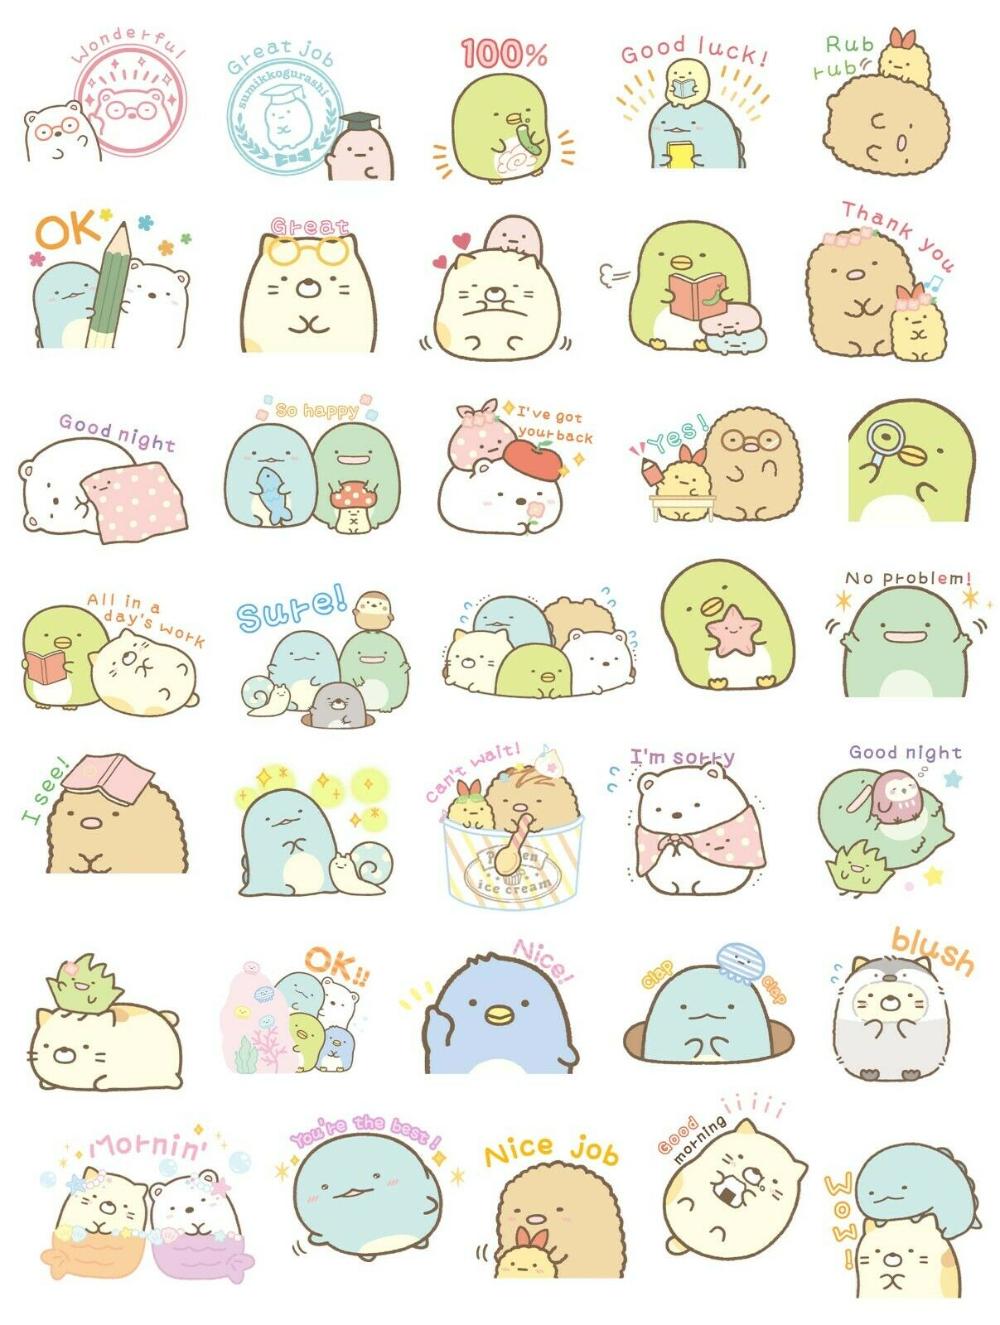 35 Cute Sumikko Gurashi Stickers Journal Stickers Kawaii Stickers Usa Ebay Journal Stickers Kawaii Stickers Stickers